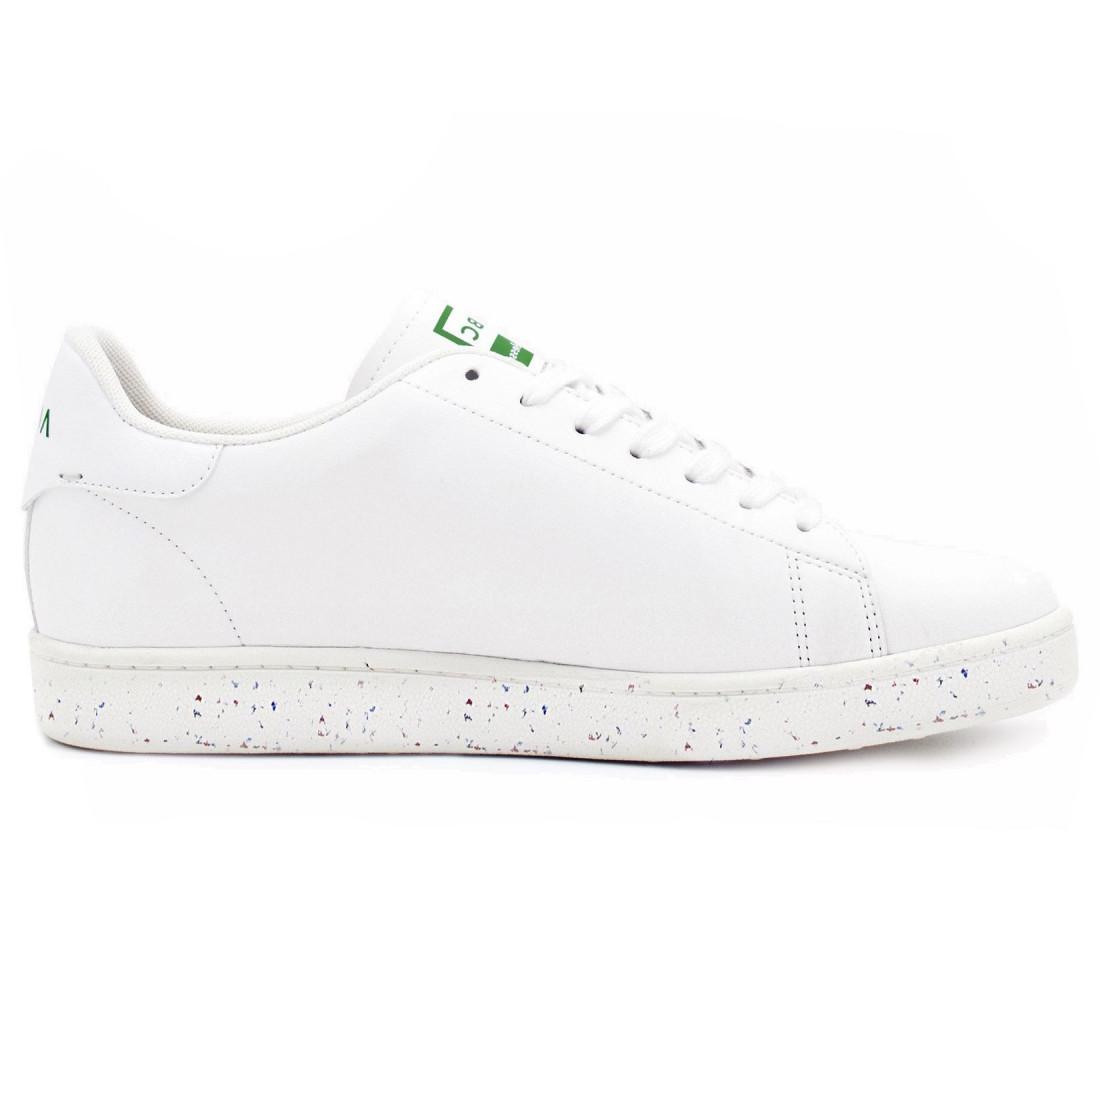 sneakers woman acbc shtl eco204 8639